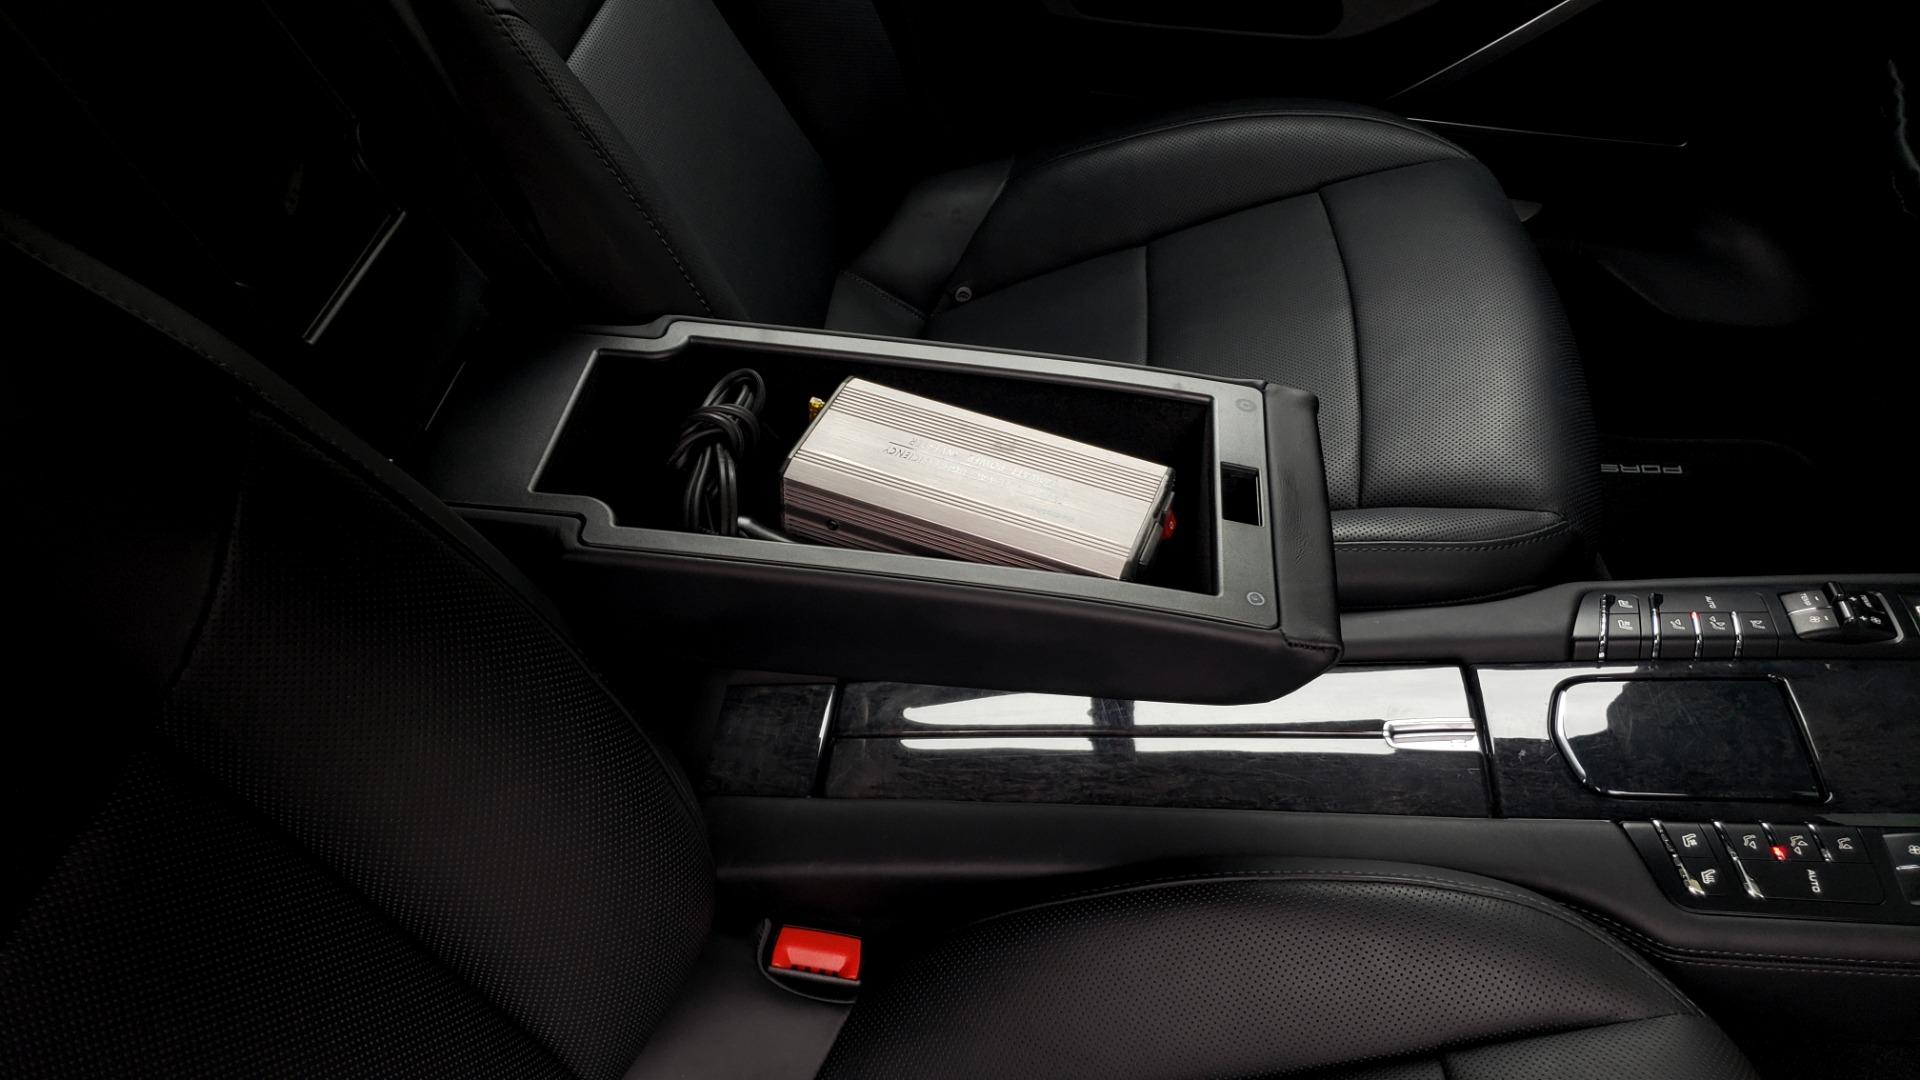 Used 2013 Porsche PANAMERA TURBO 4.8L V8 / AWD / NAV / SUNROOF / LCA / PARK ASST / BURMESTER for sale $45,995 at Formula Imports in Charlotte NC 28227 80